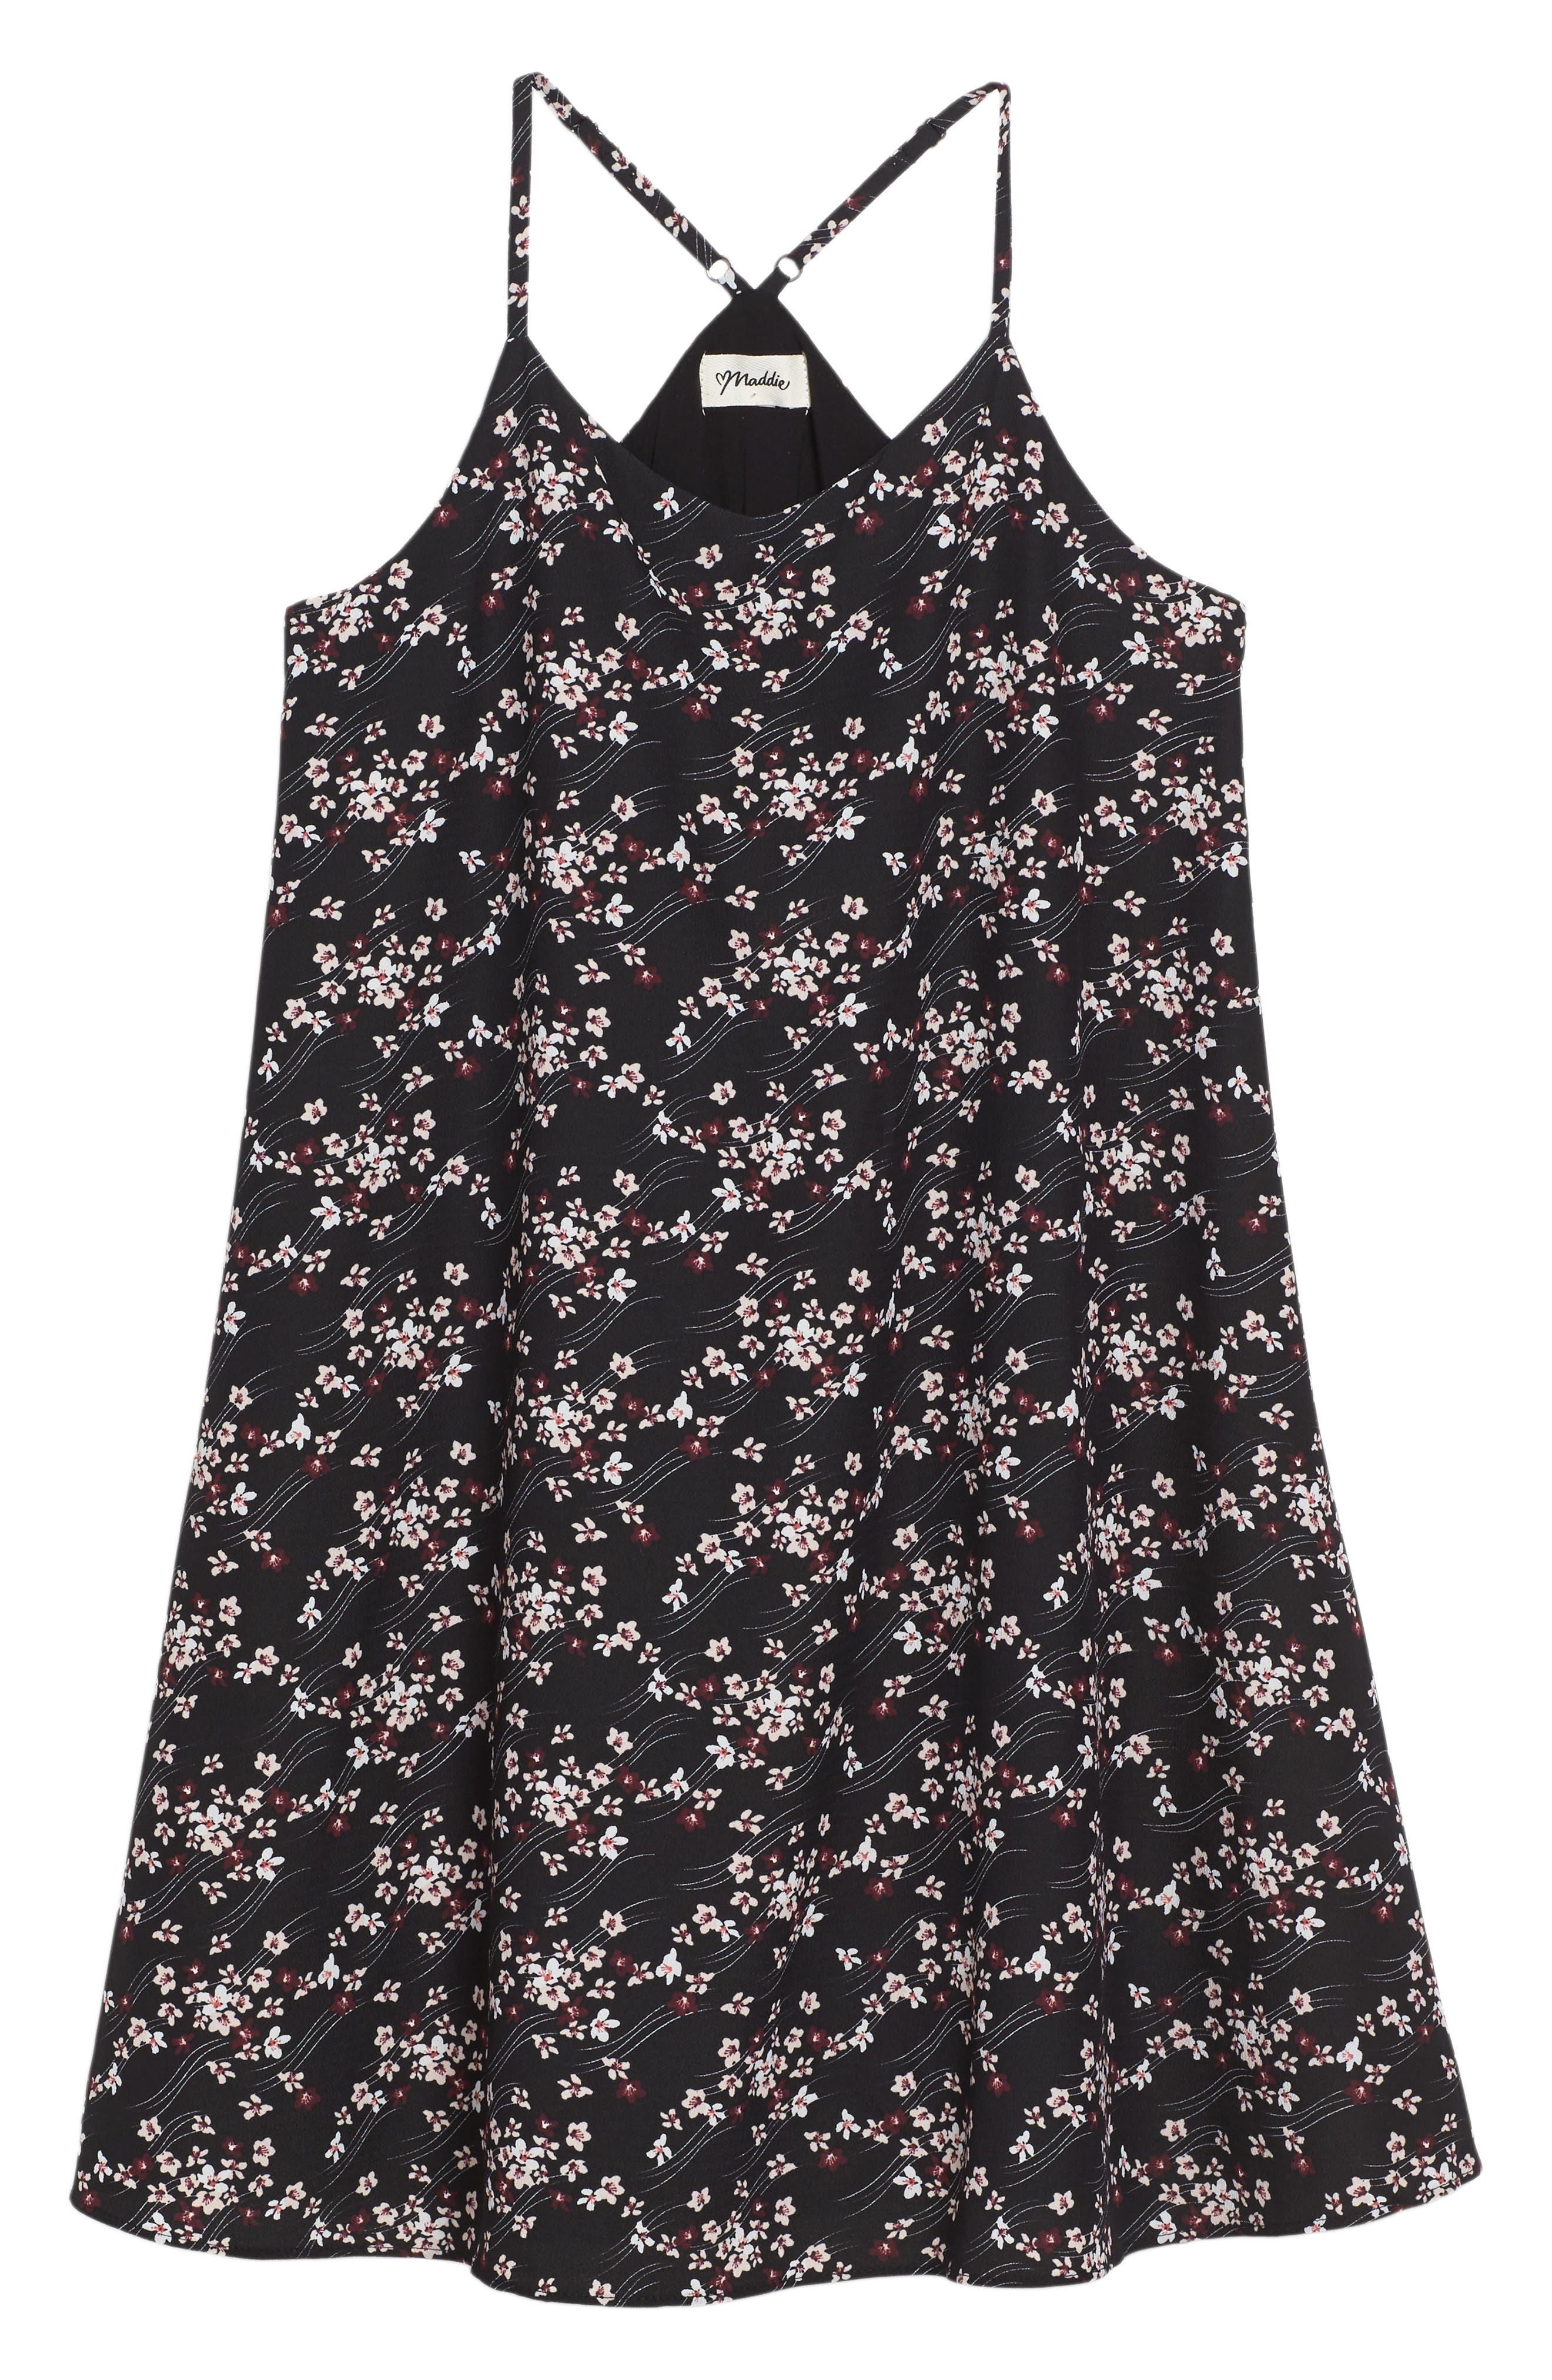 Alternate Image 1 Selected - Maddie Floral Print Slip Dress (Big Girls)